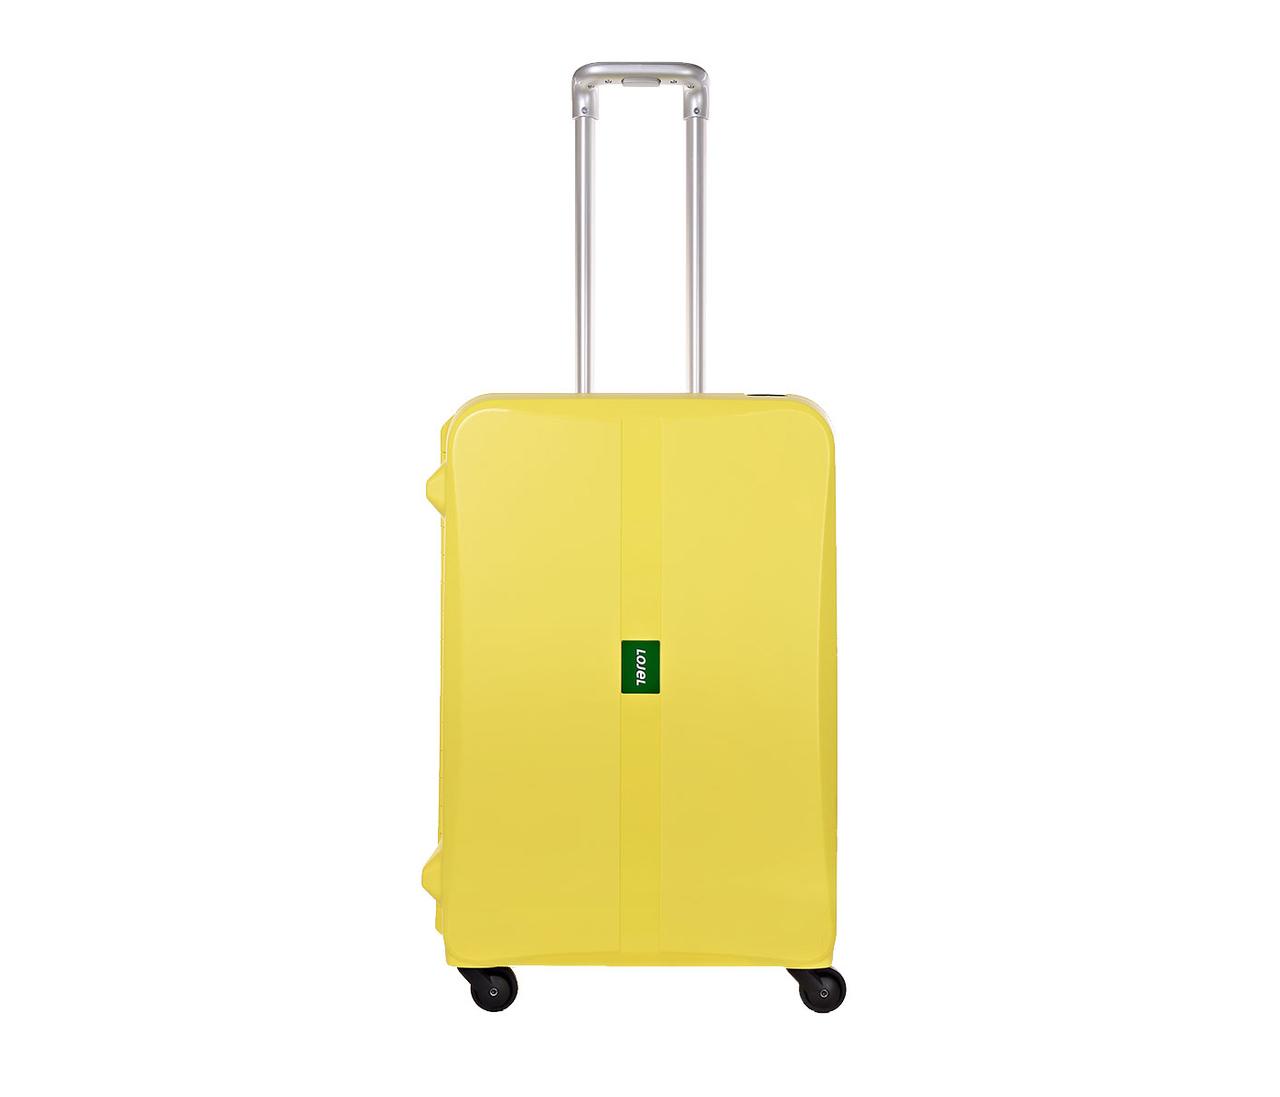 Octa Yellow